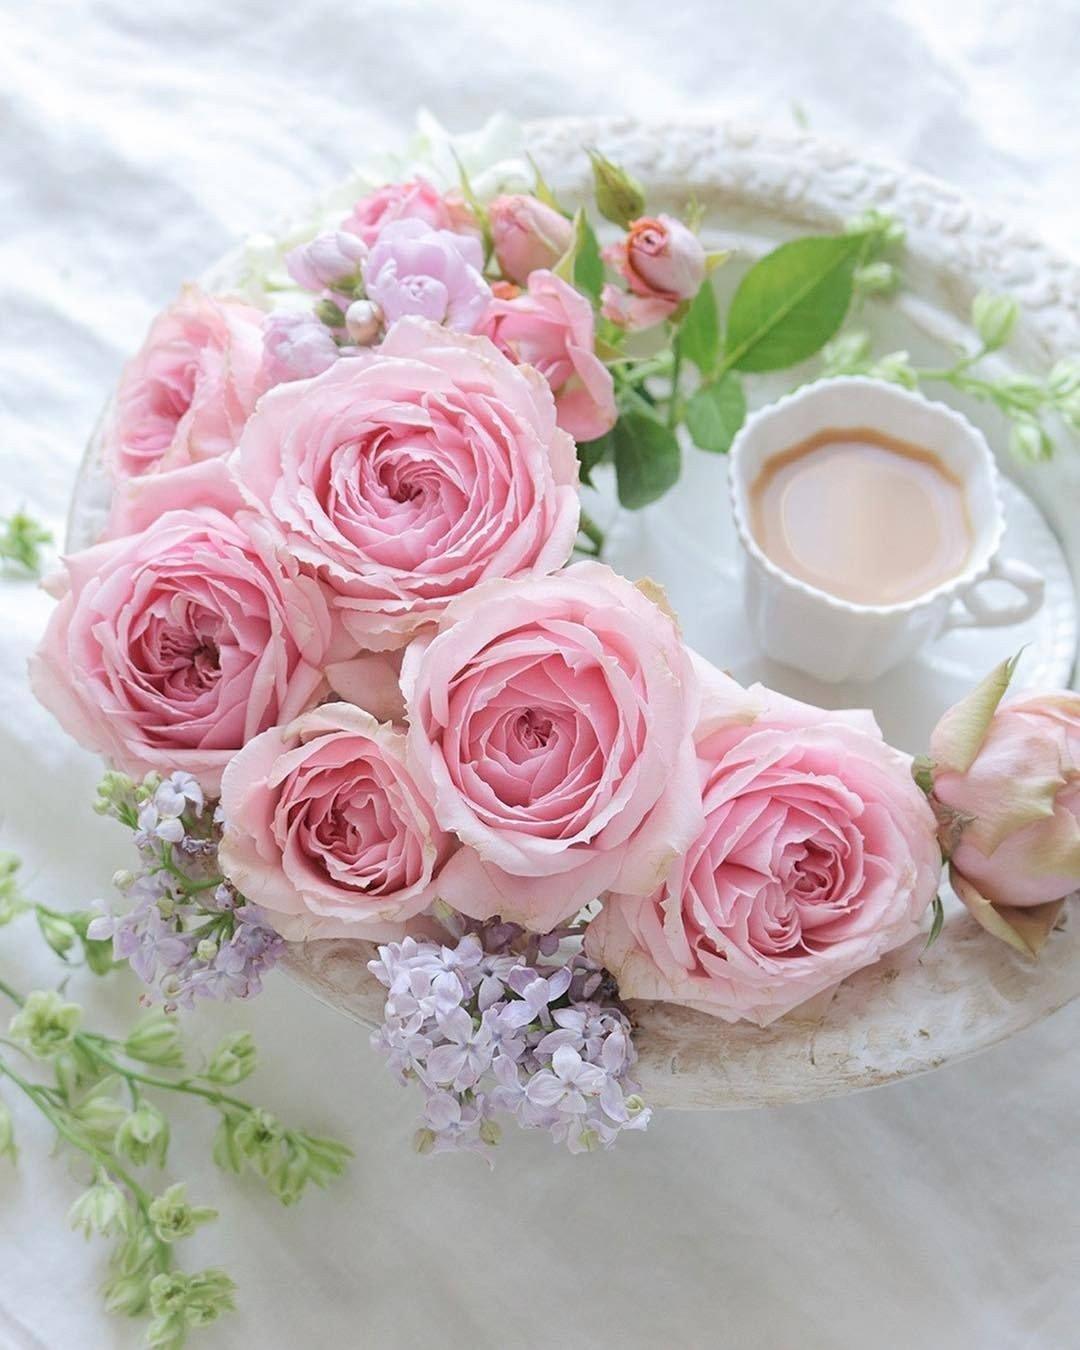 открытка розовое утро они смогут